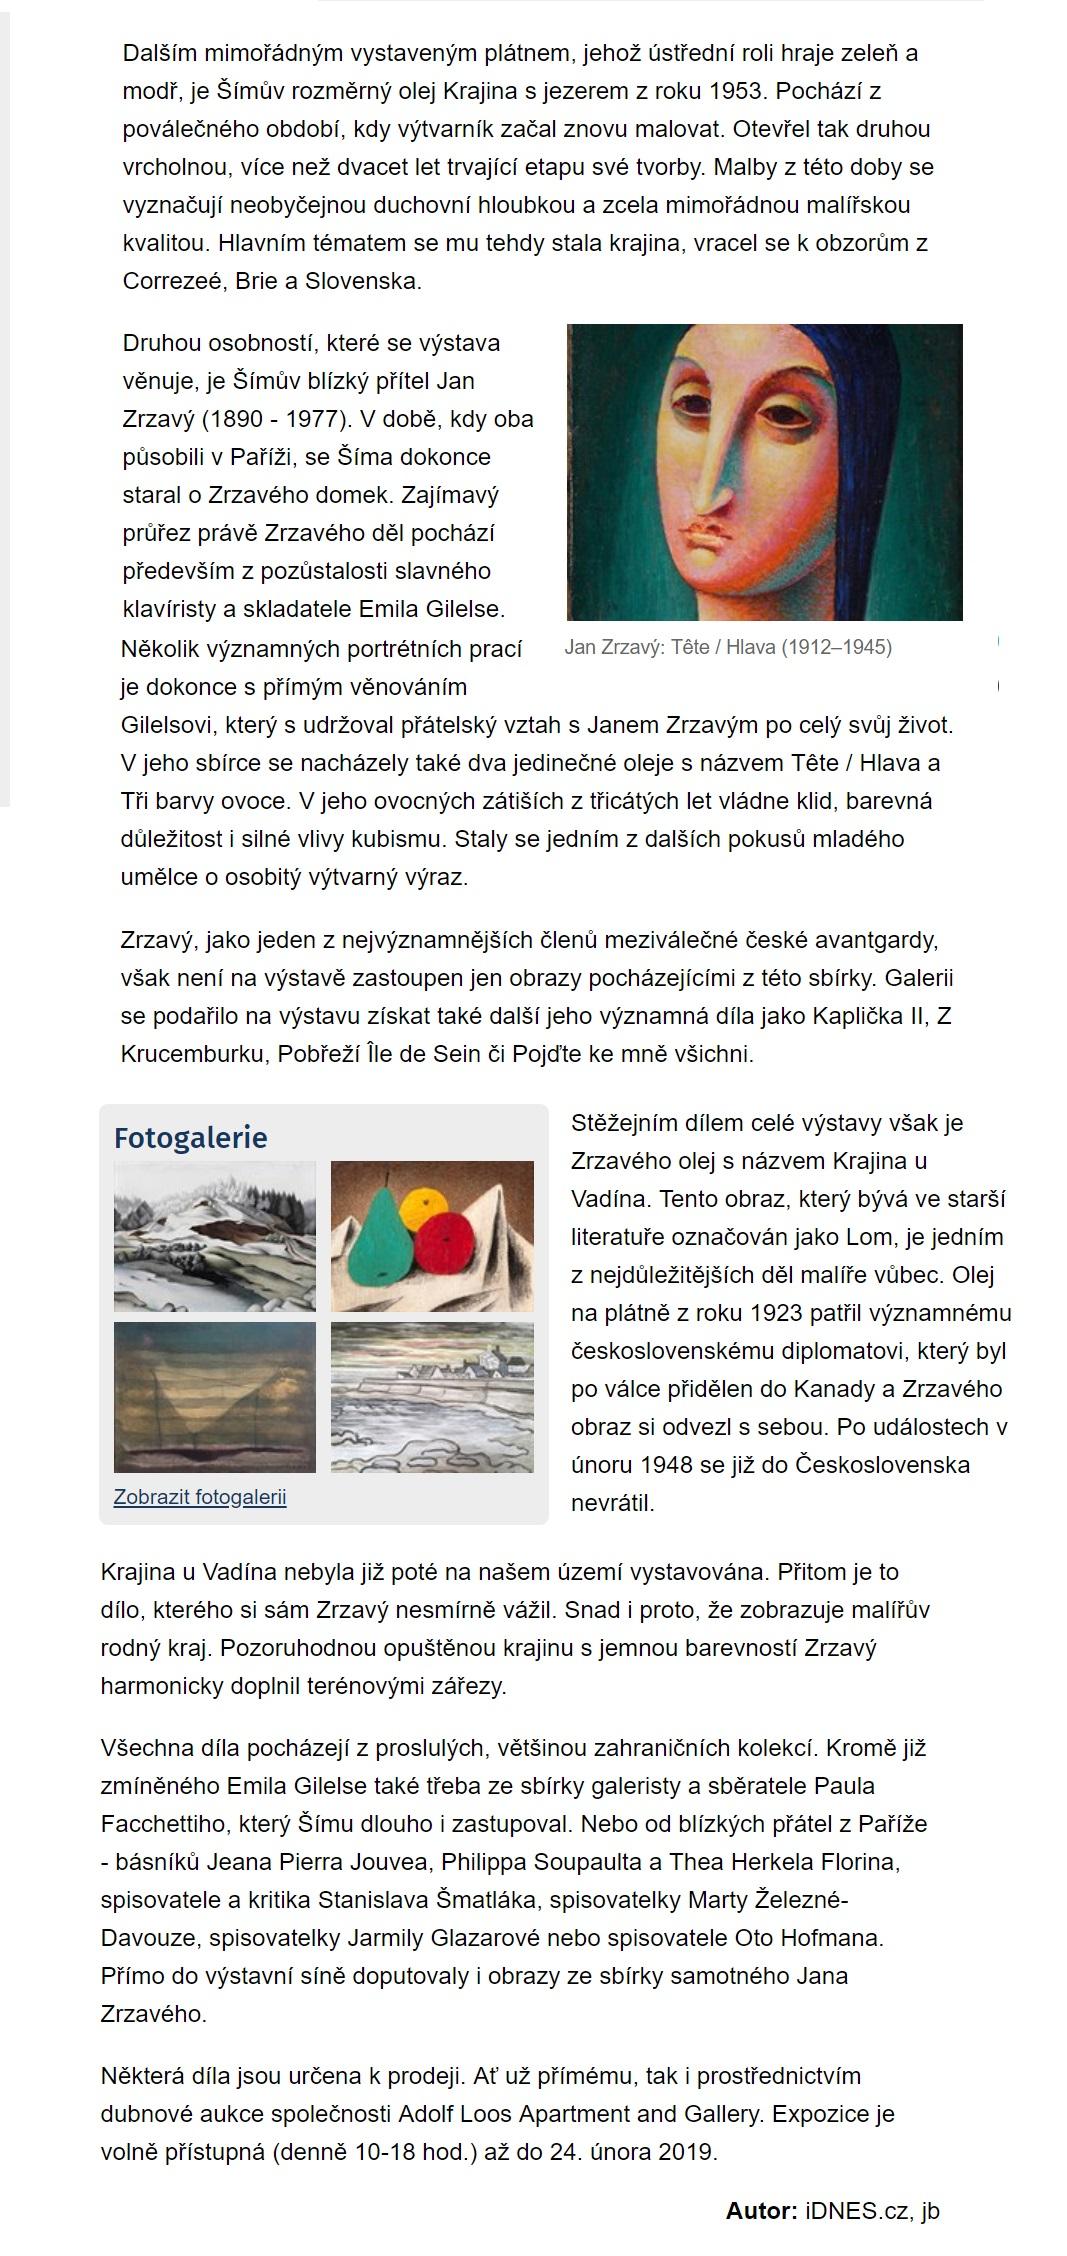 iDNES.cz, 16.2.2019